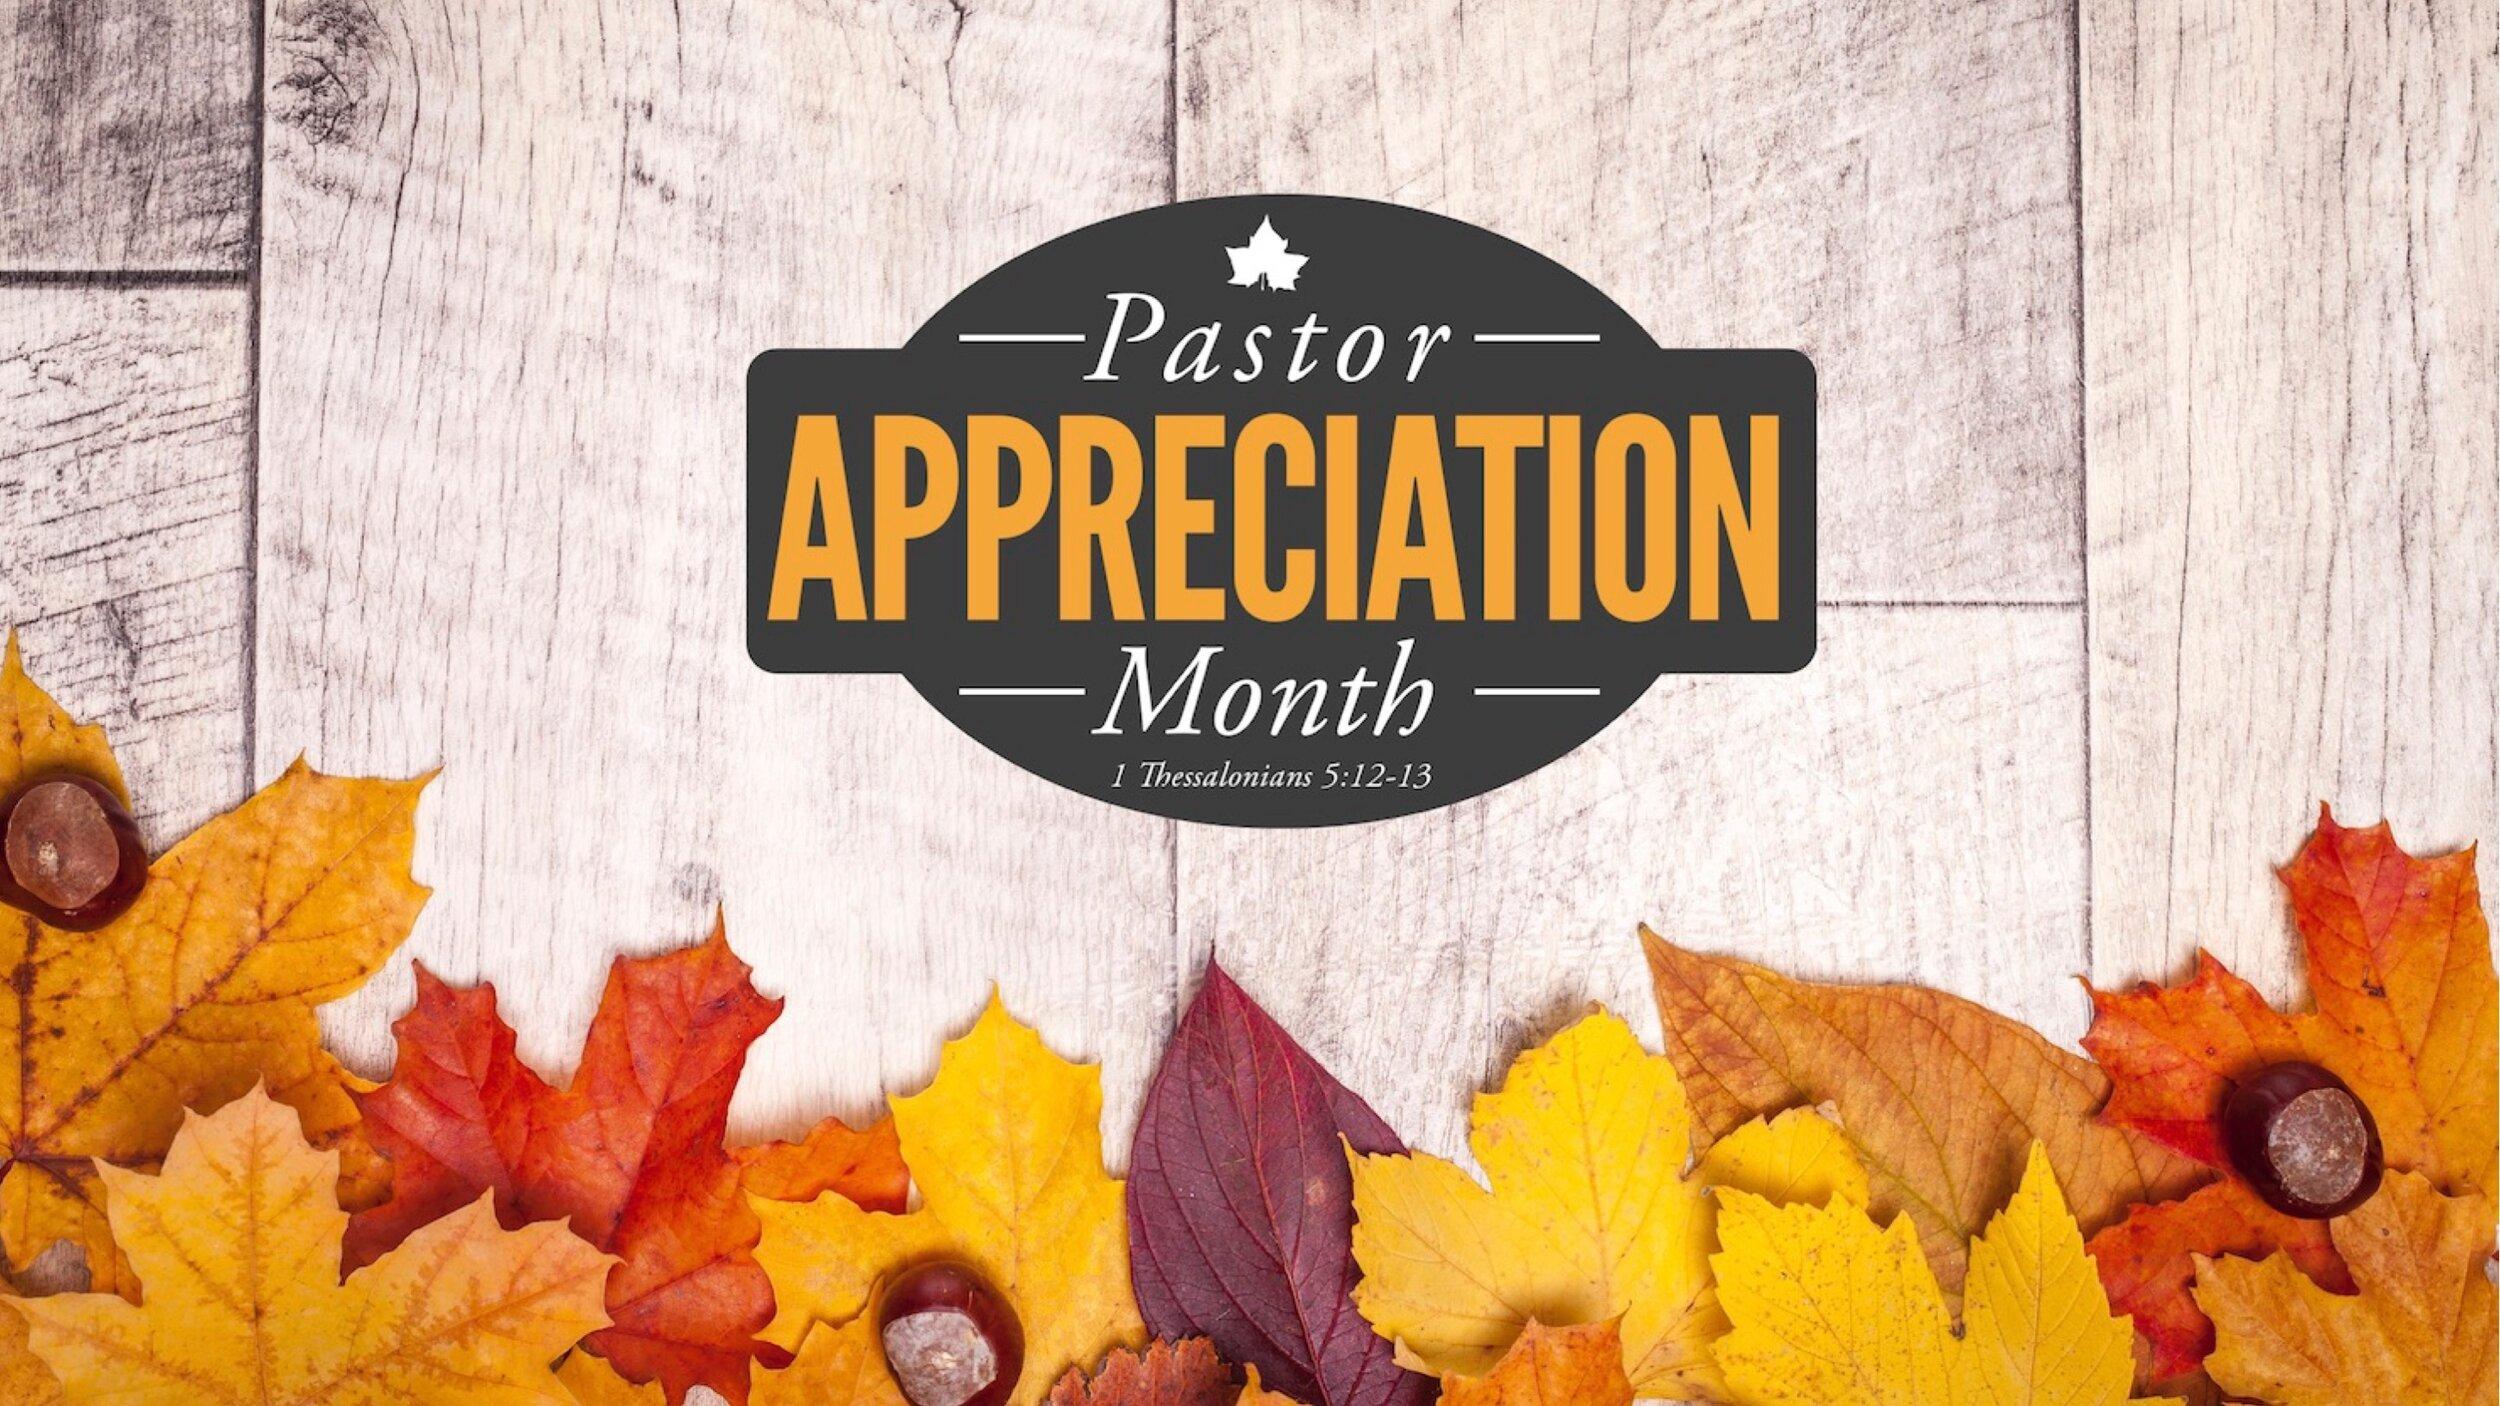 Pastor Appreciation Month 2019 16x9.jpg